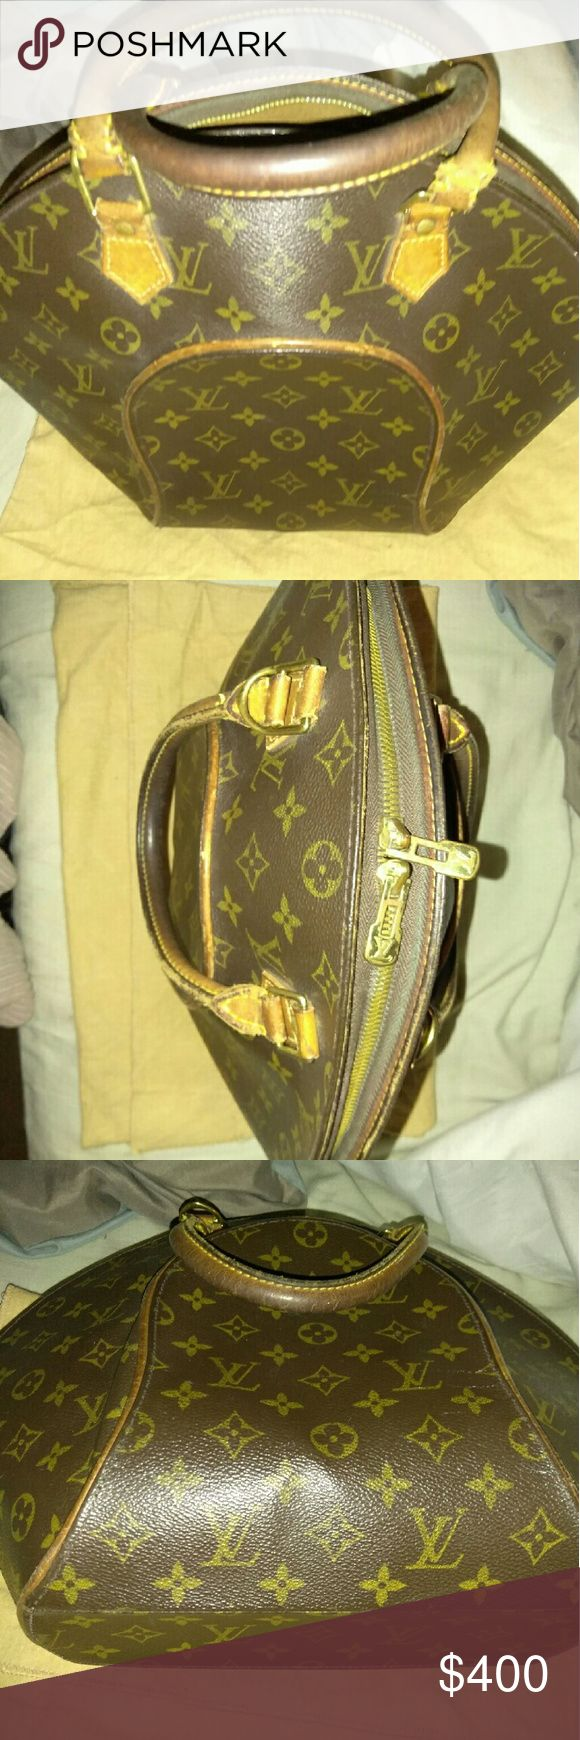 Louis Vuitton Eclipse medium Vintage condition. Minor stains, awesome buy! Louis Vuitton Bags Satchels